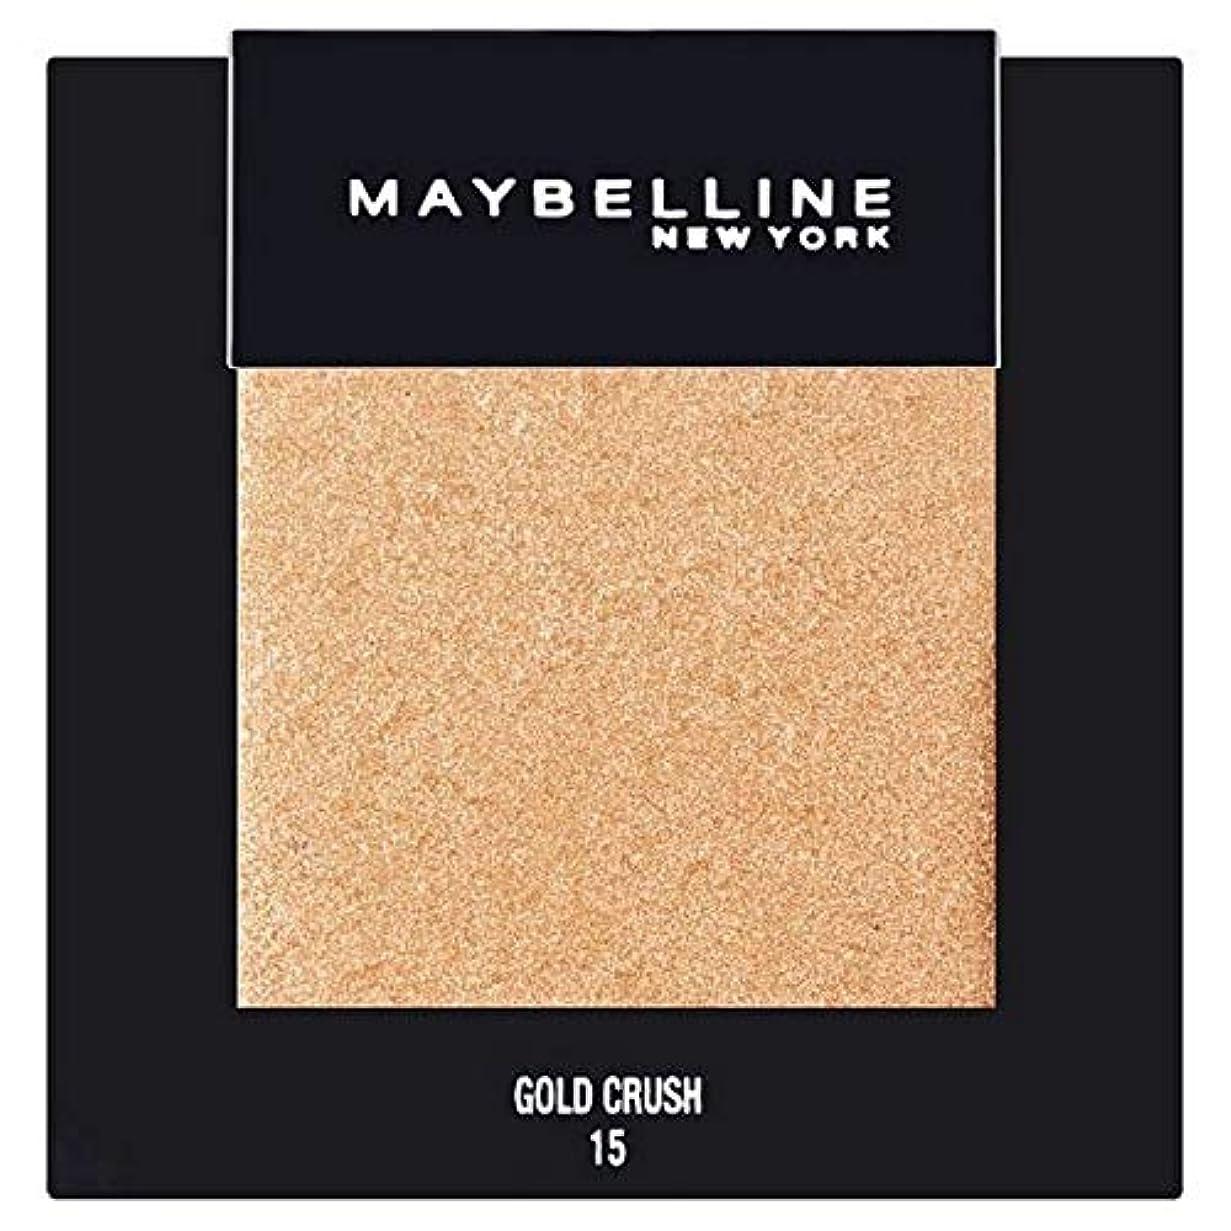 [Maybelline ] メイベリンカラーショーシングルアイシャドウ15金クラッシュ - Maybelline Color Show Single Eyeshadow 15 Gold Crush [並行輸入品]